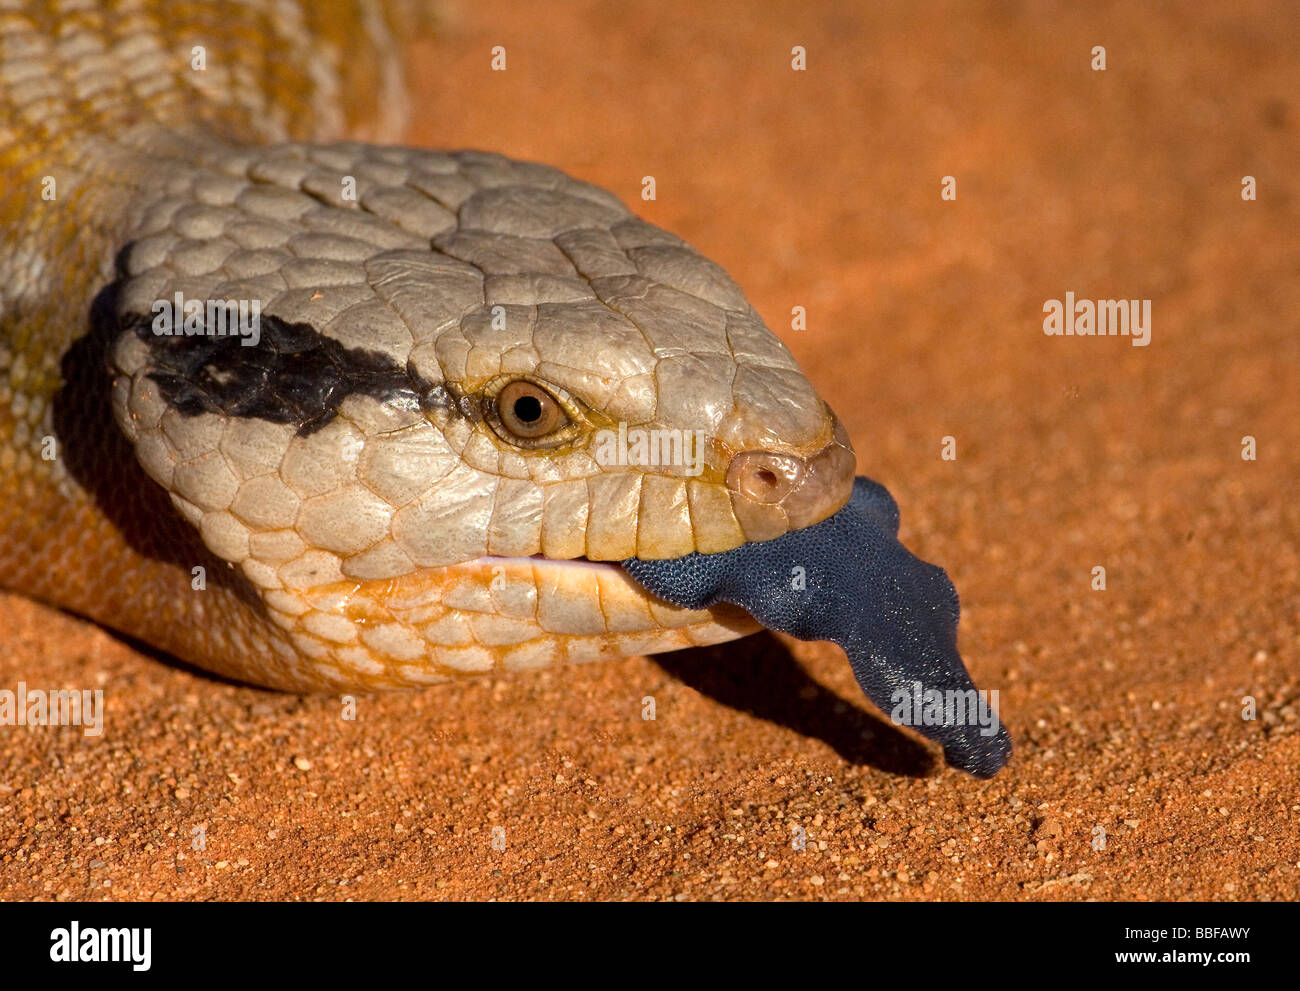 Tongue of Centralian blue tongue Australian skink - Stock Image